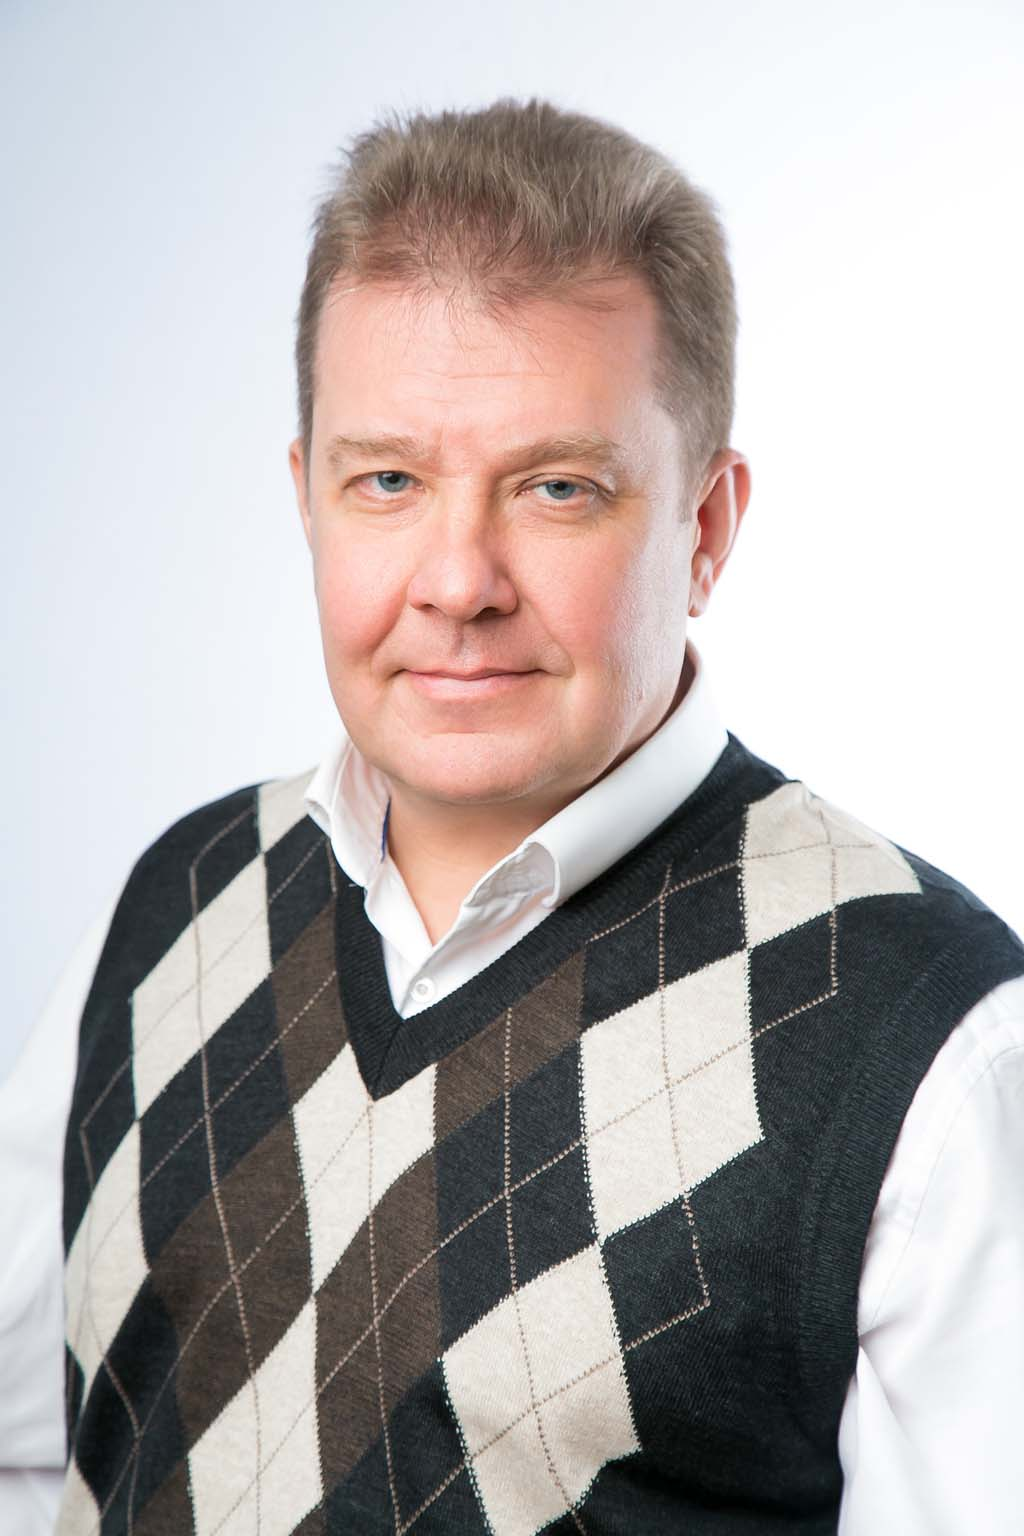 Sidorov Kirill Vladimirovich